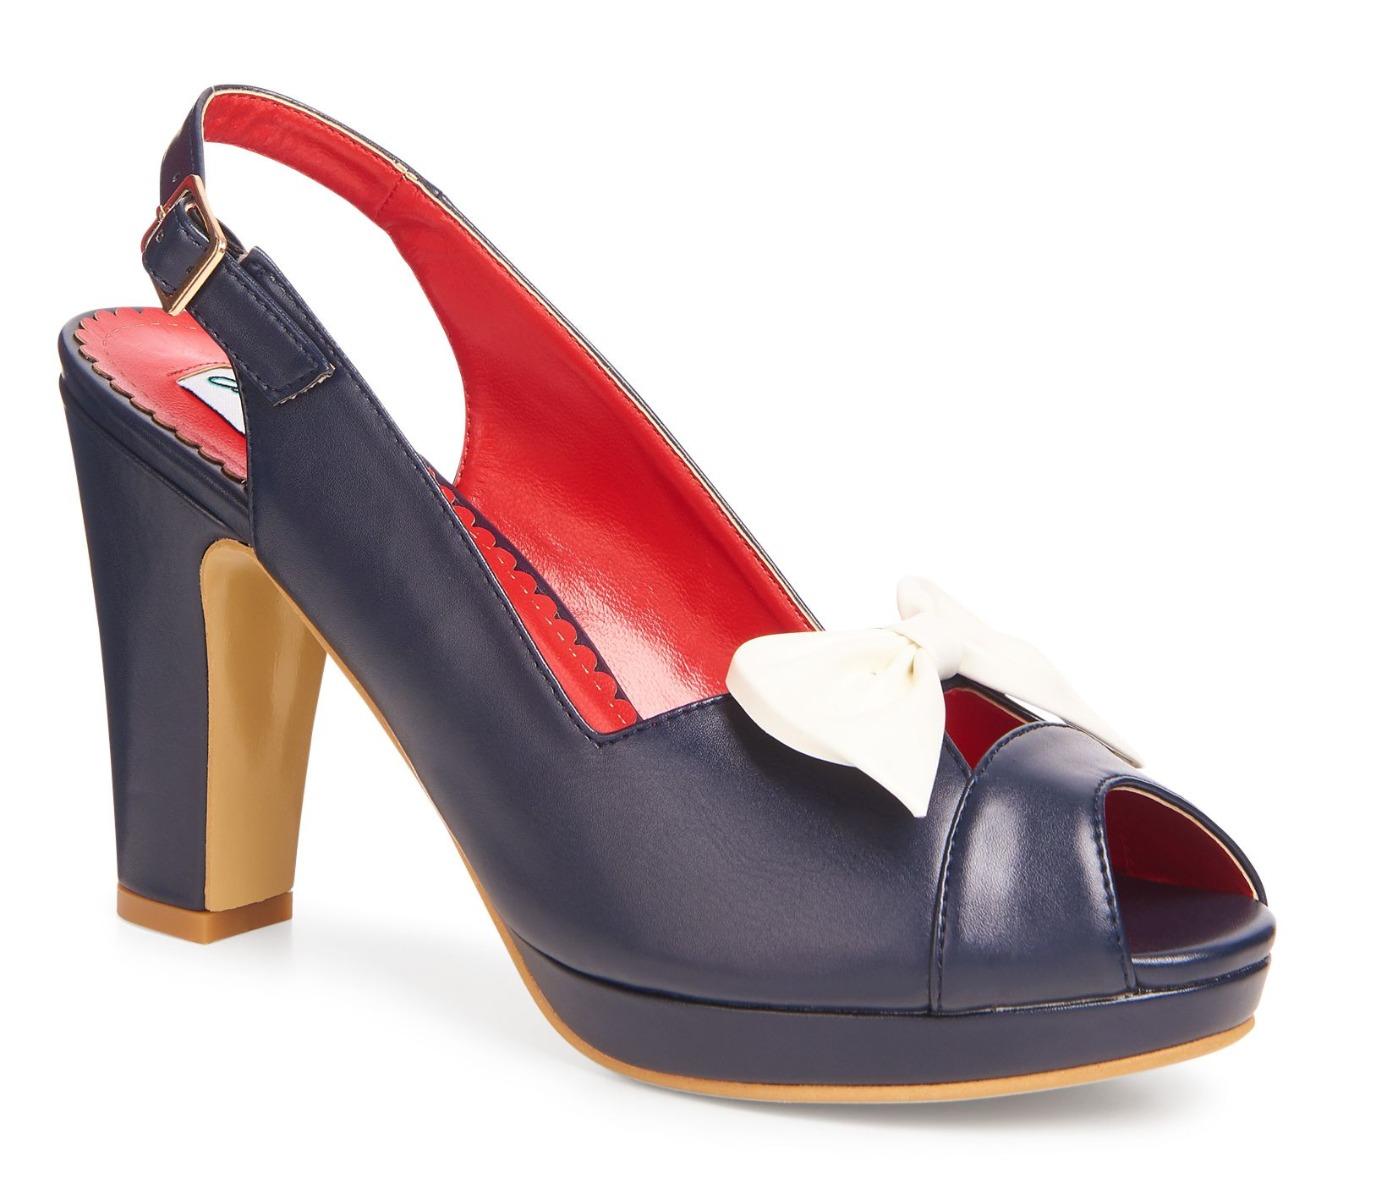 lususanna_chaussures-escarpins-pin-up-rockabilly-50-s-glamour-susan-bleu-marine